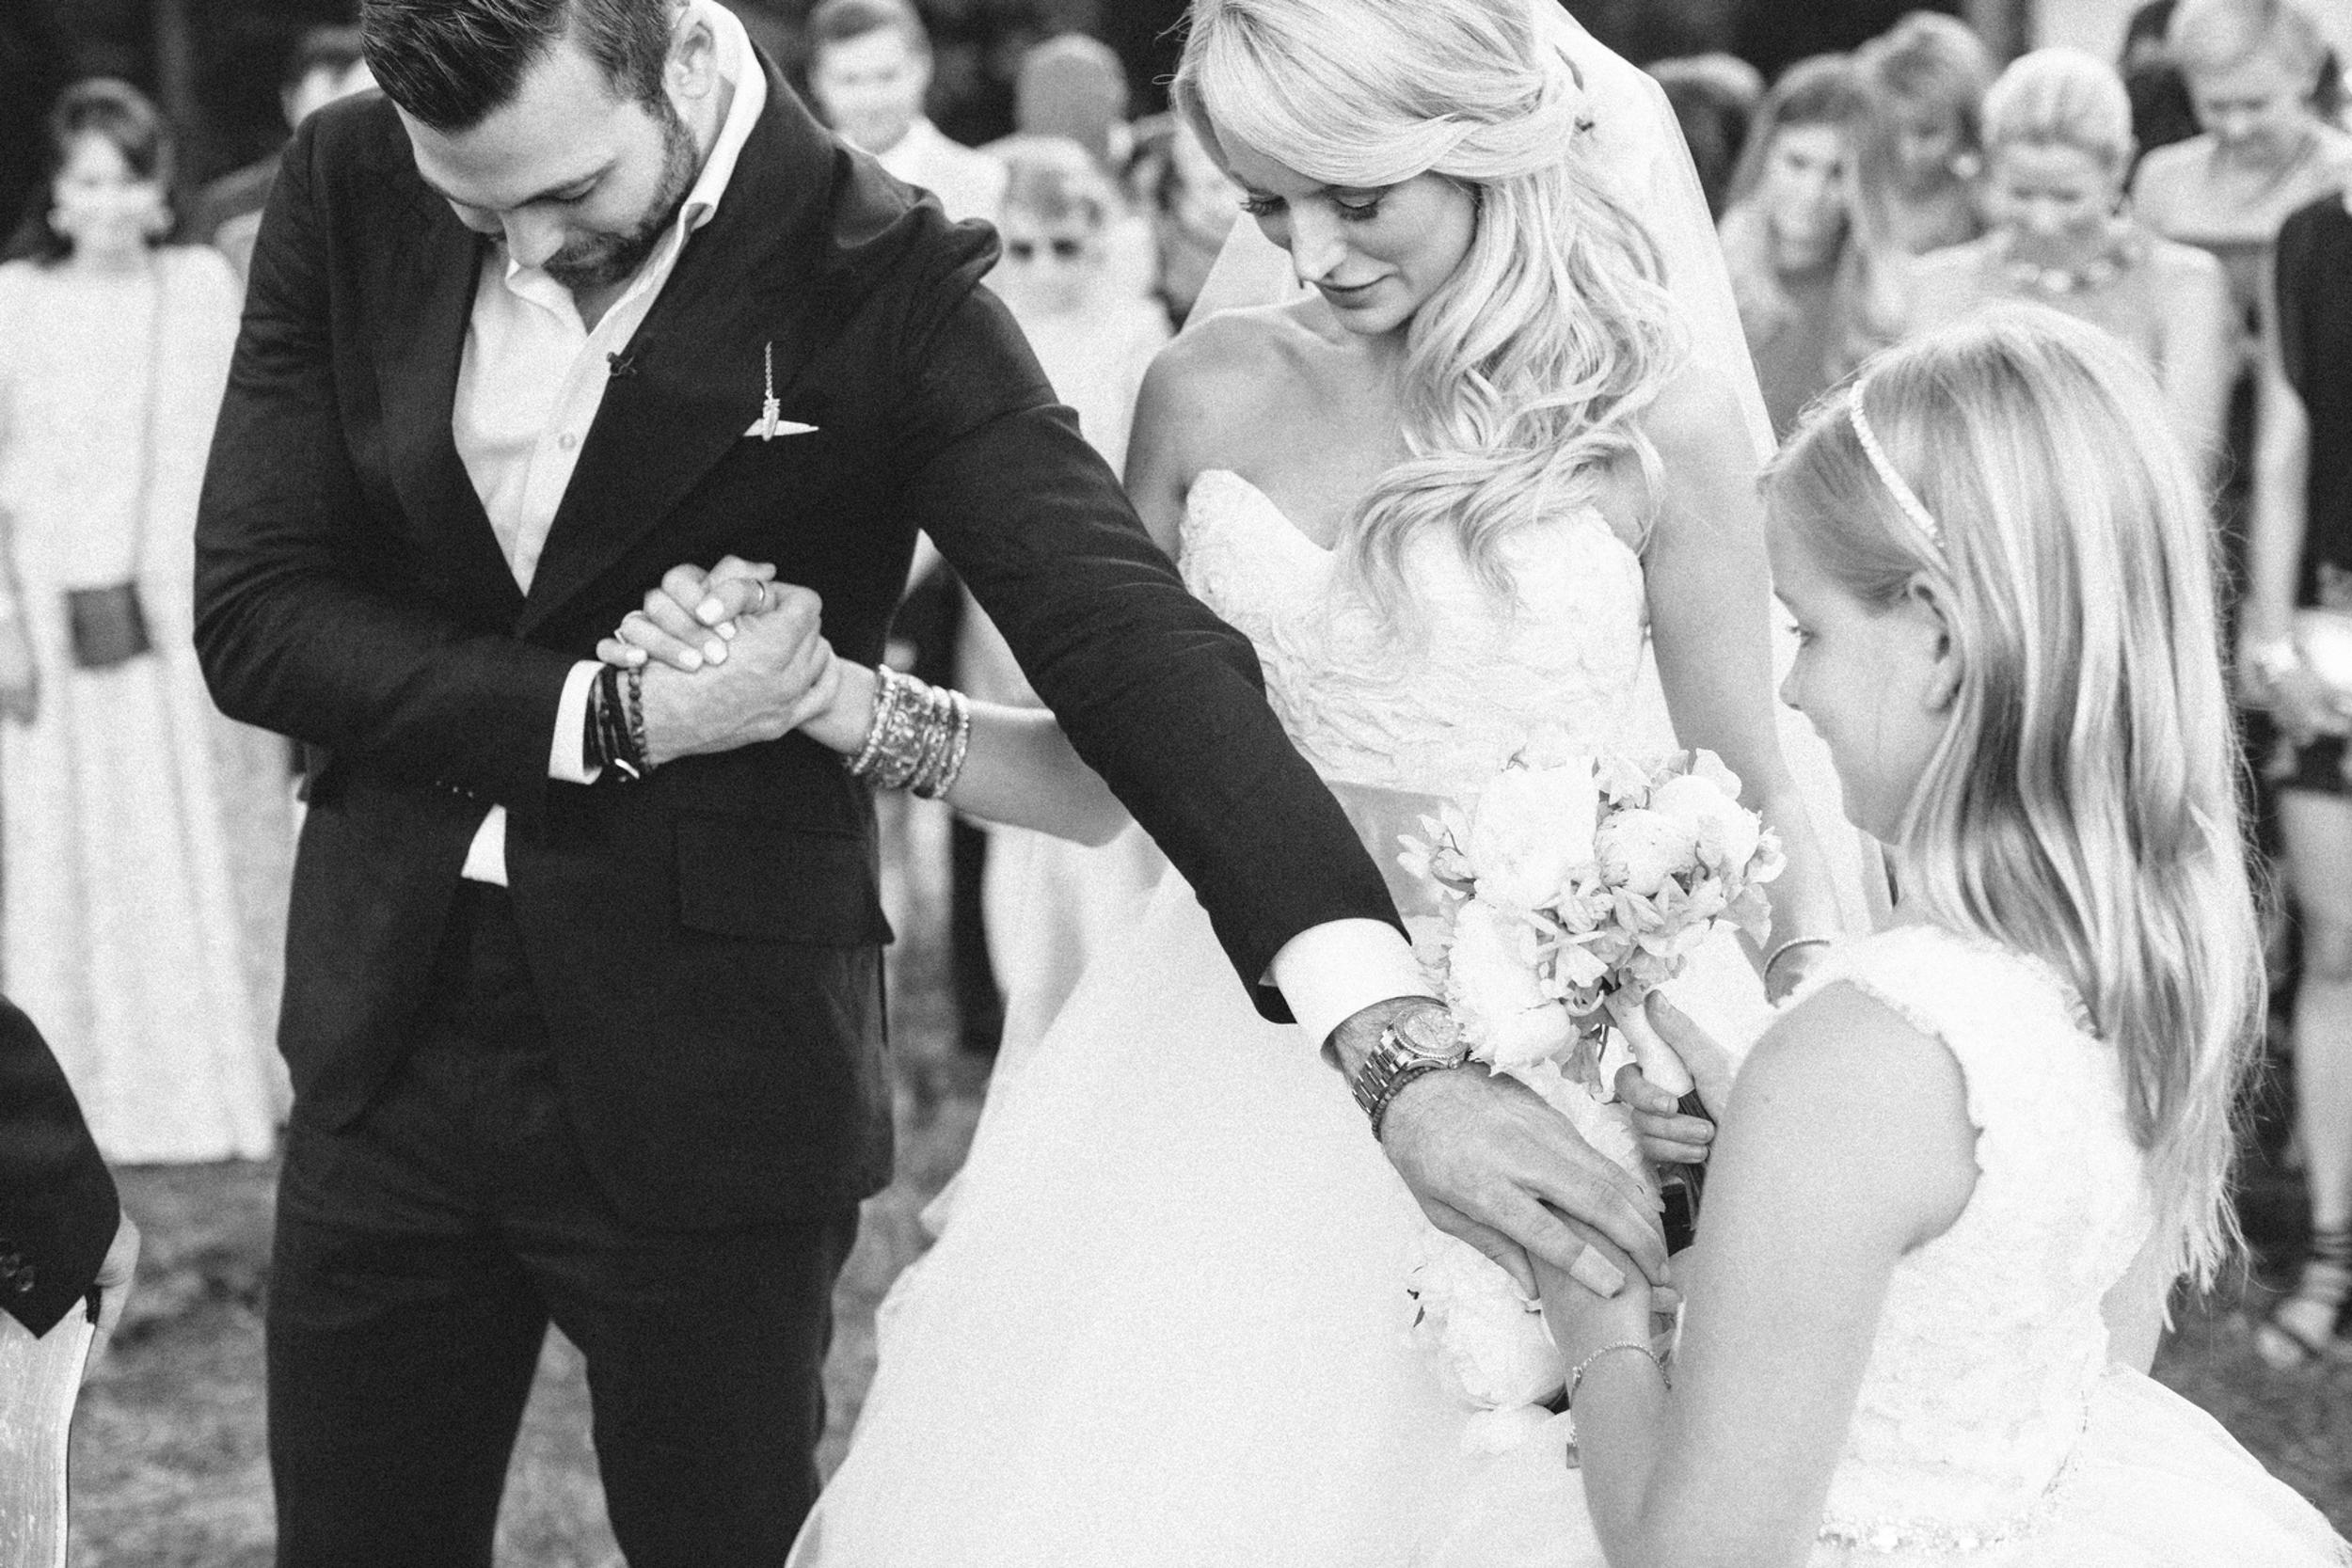 south_carolina_farm_wedding_rustic_chic_surprise_secret_luxe_wedding_bachelorette_emily_maynard_real_weddings-24.jpg